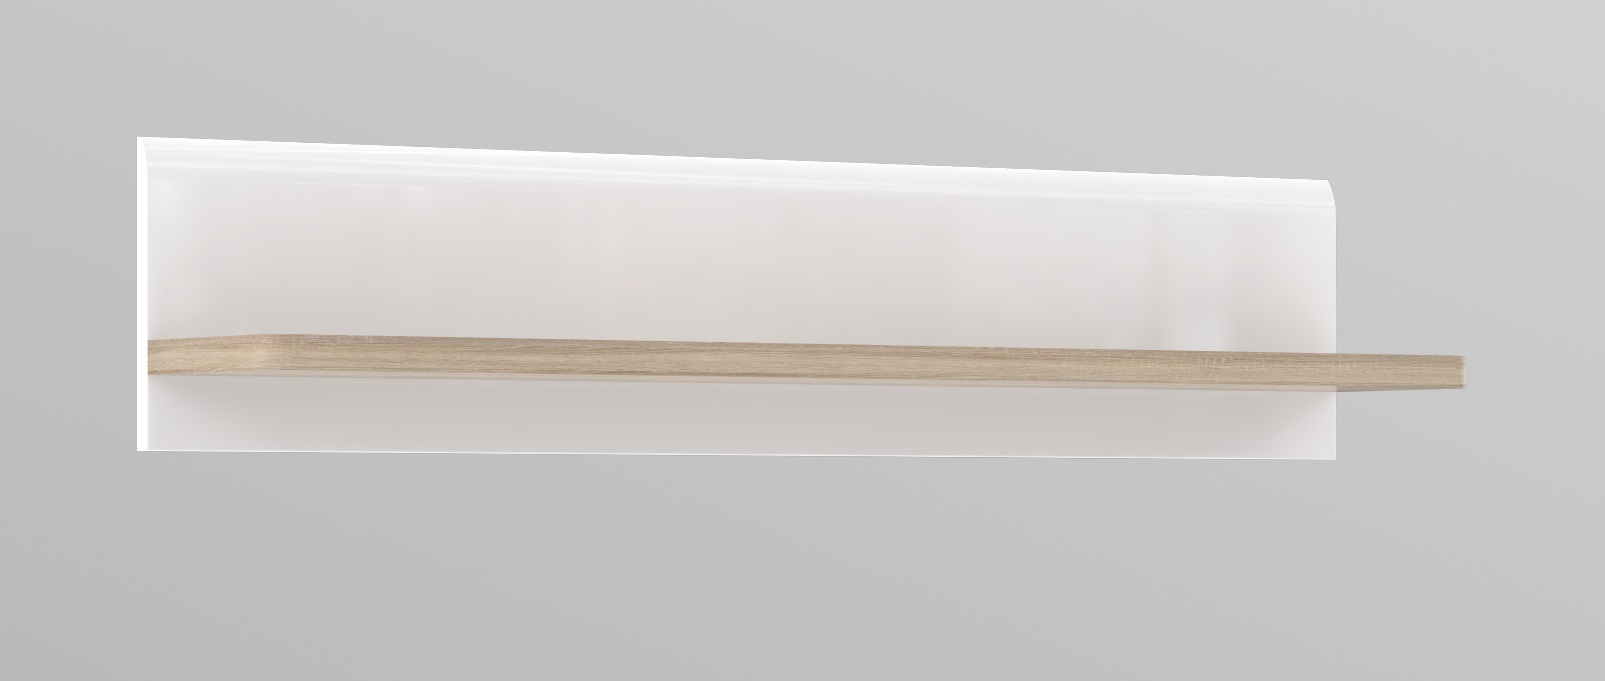 Wandregal Inkl Beleuchtung Attention Von Forte Weiss Sonoma